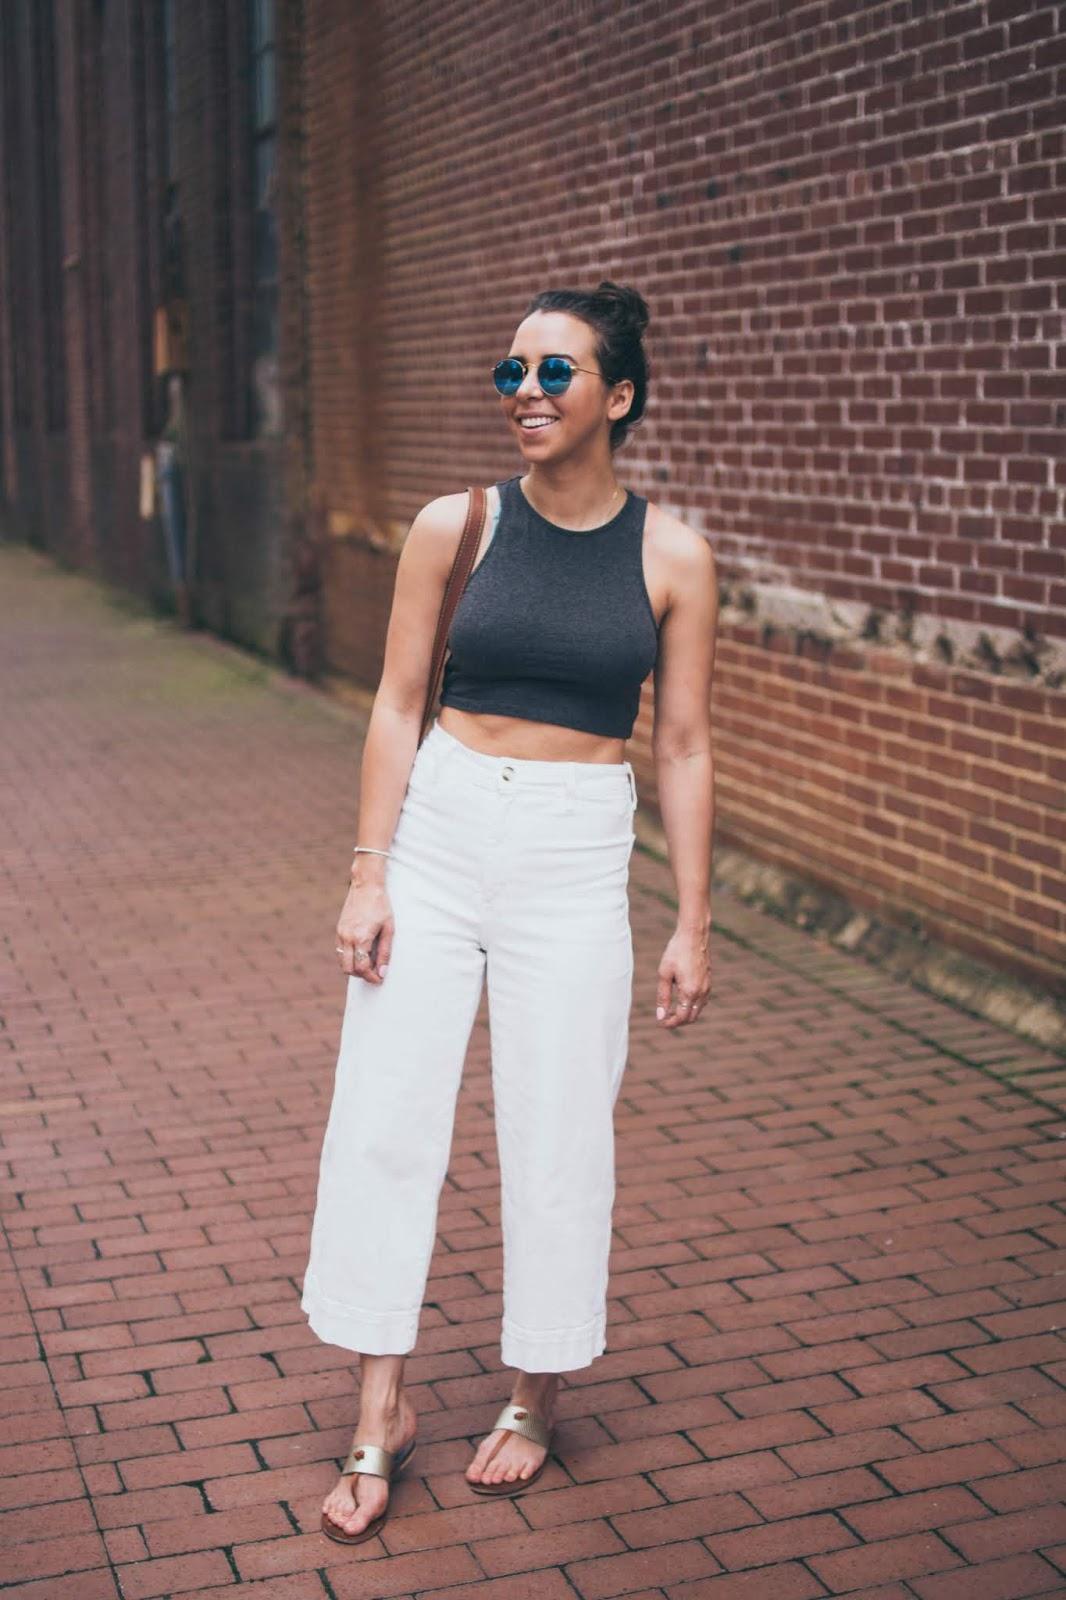 high-waist-white-culottes-casual-style-dc-blogger-avizastyle-andrea-viza